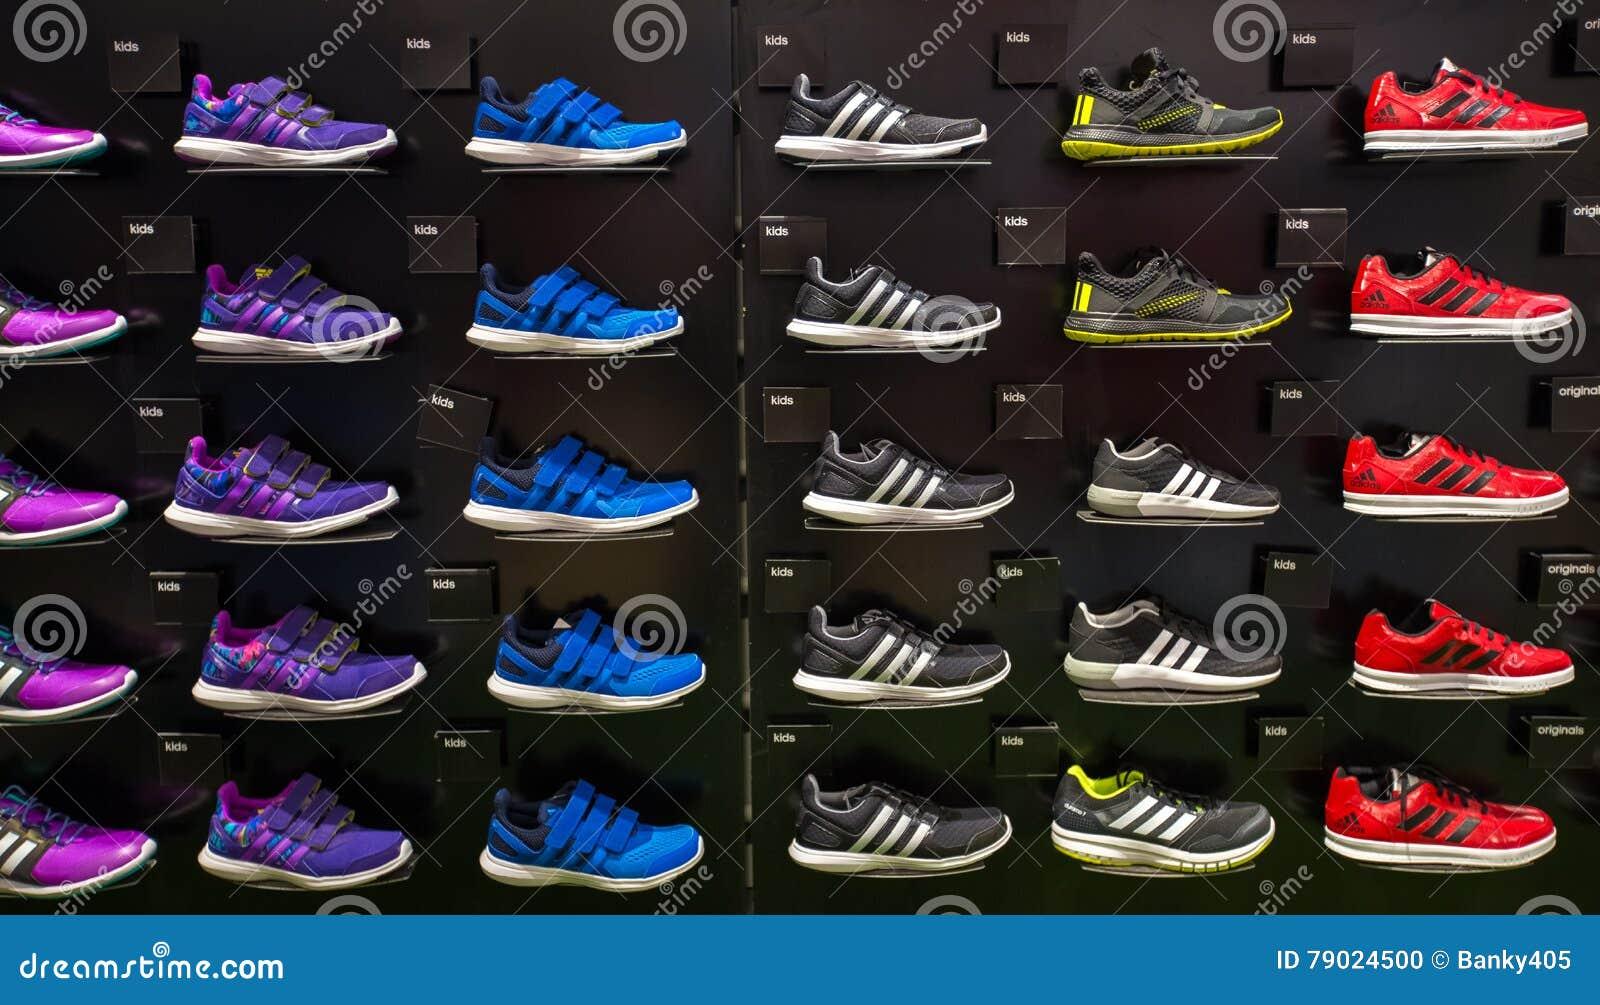 Adidas interno immagazzina in Siam Paragon Shopping Mall a Bangkok, Tailandia